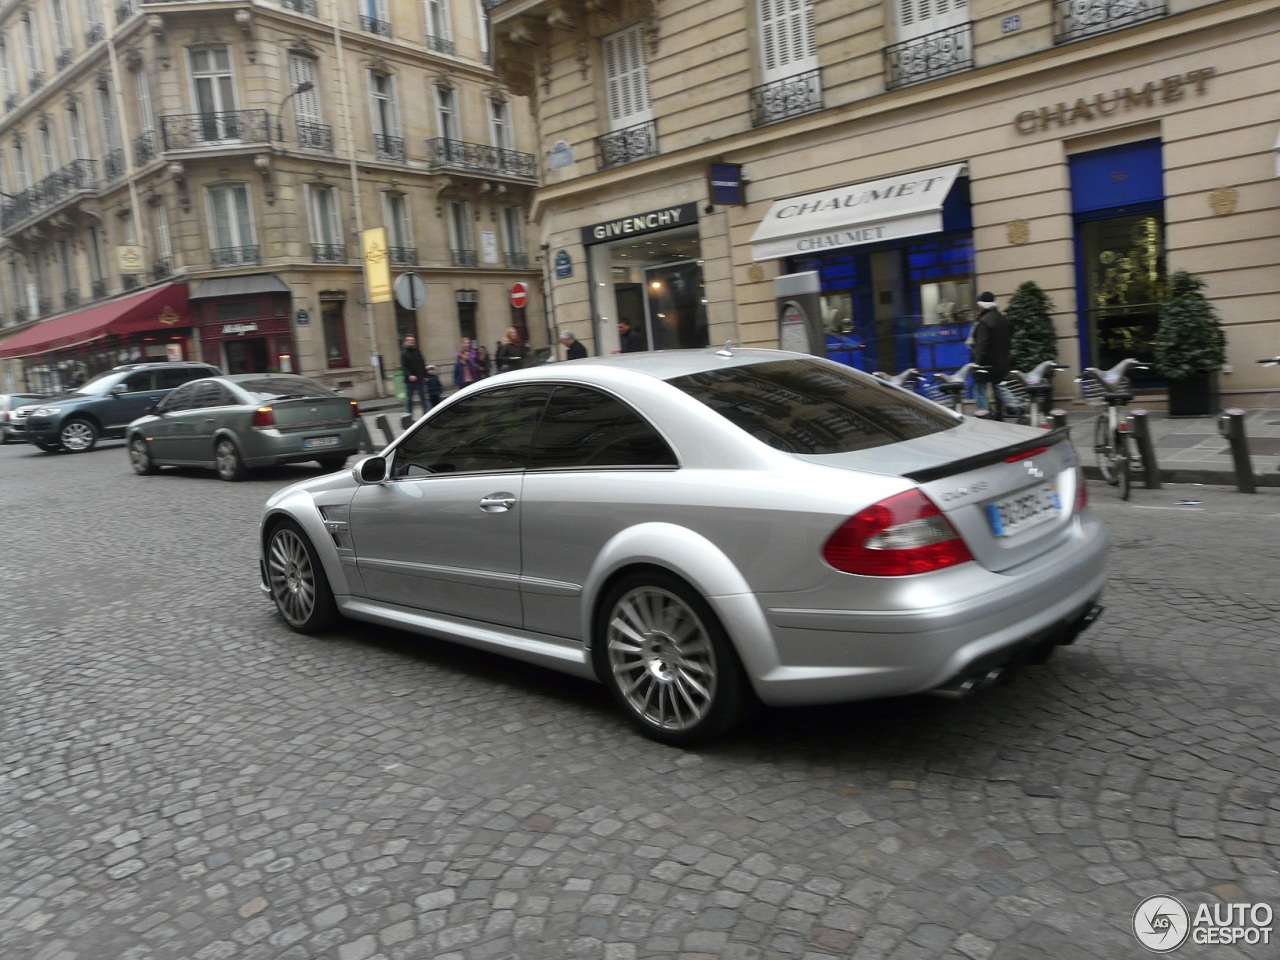 Mercedes benz clk 63 amg black series 30 march 2013 for Mercedes benz clk 2013